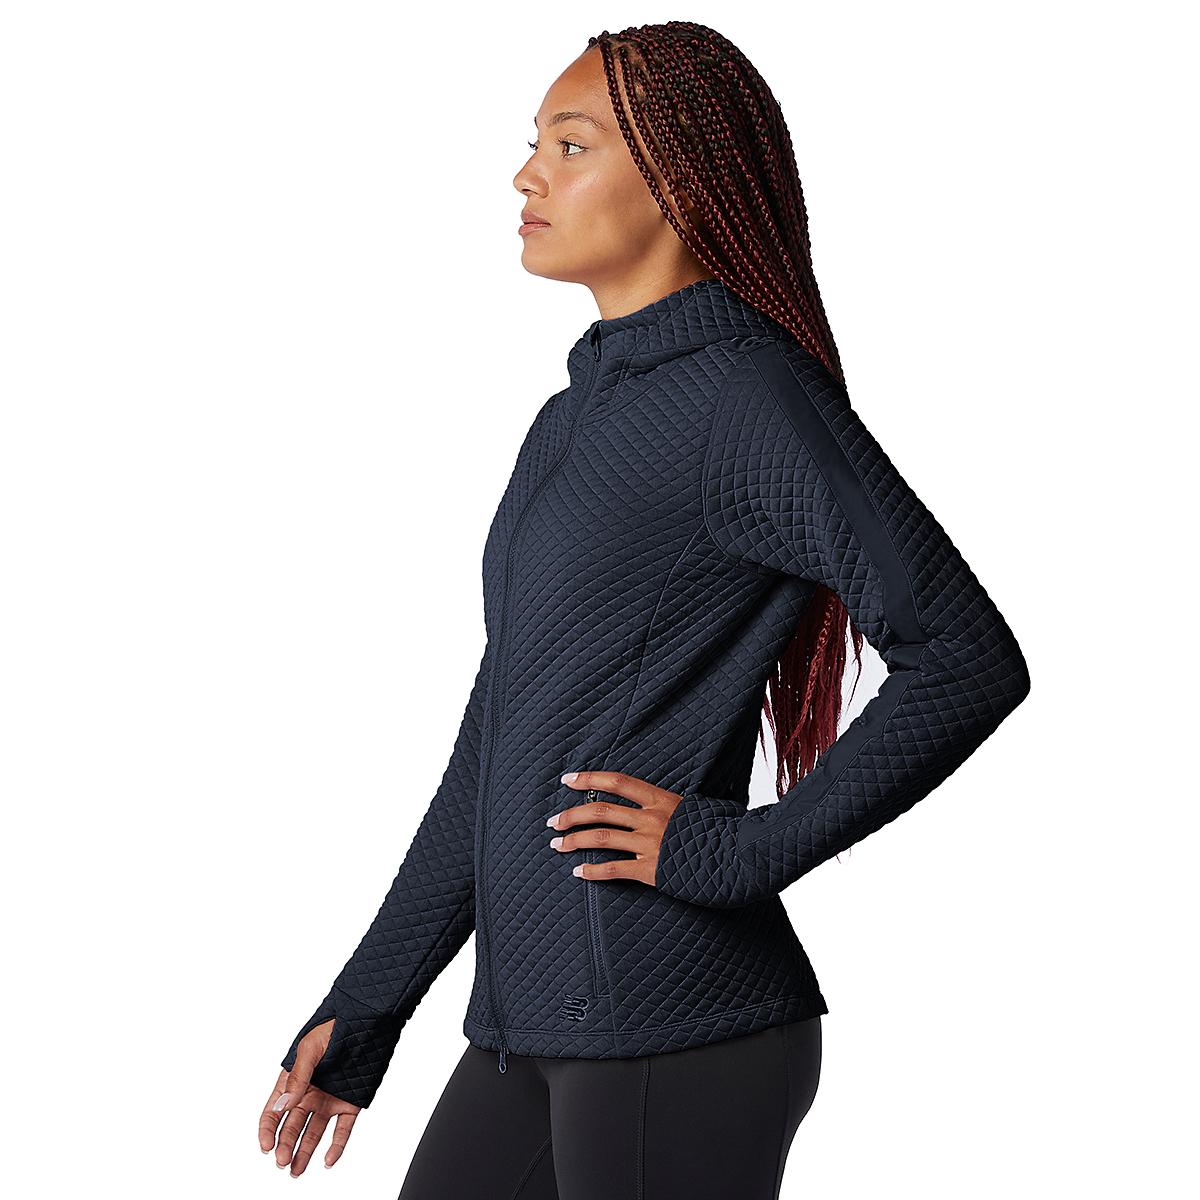 Women's New Balance Heatloft Jacket - Color: Eclipse Heather - Size: XS, Eclipse Heather, large, image 3